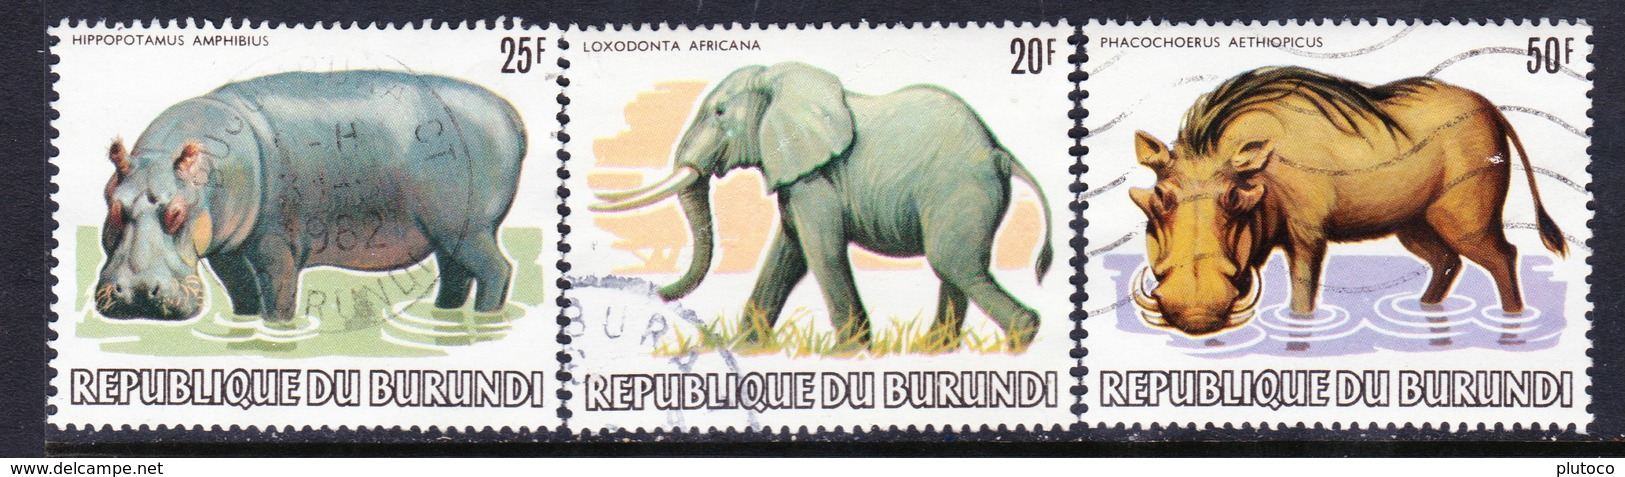 BURUNDI, USED STAMP, OBLITERÉ, SELLO USADO. - Burundi